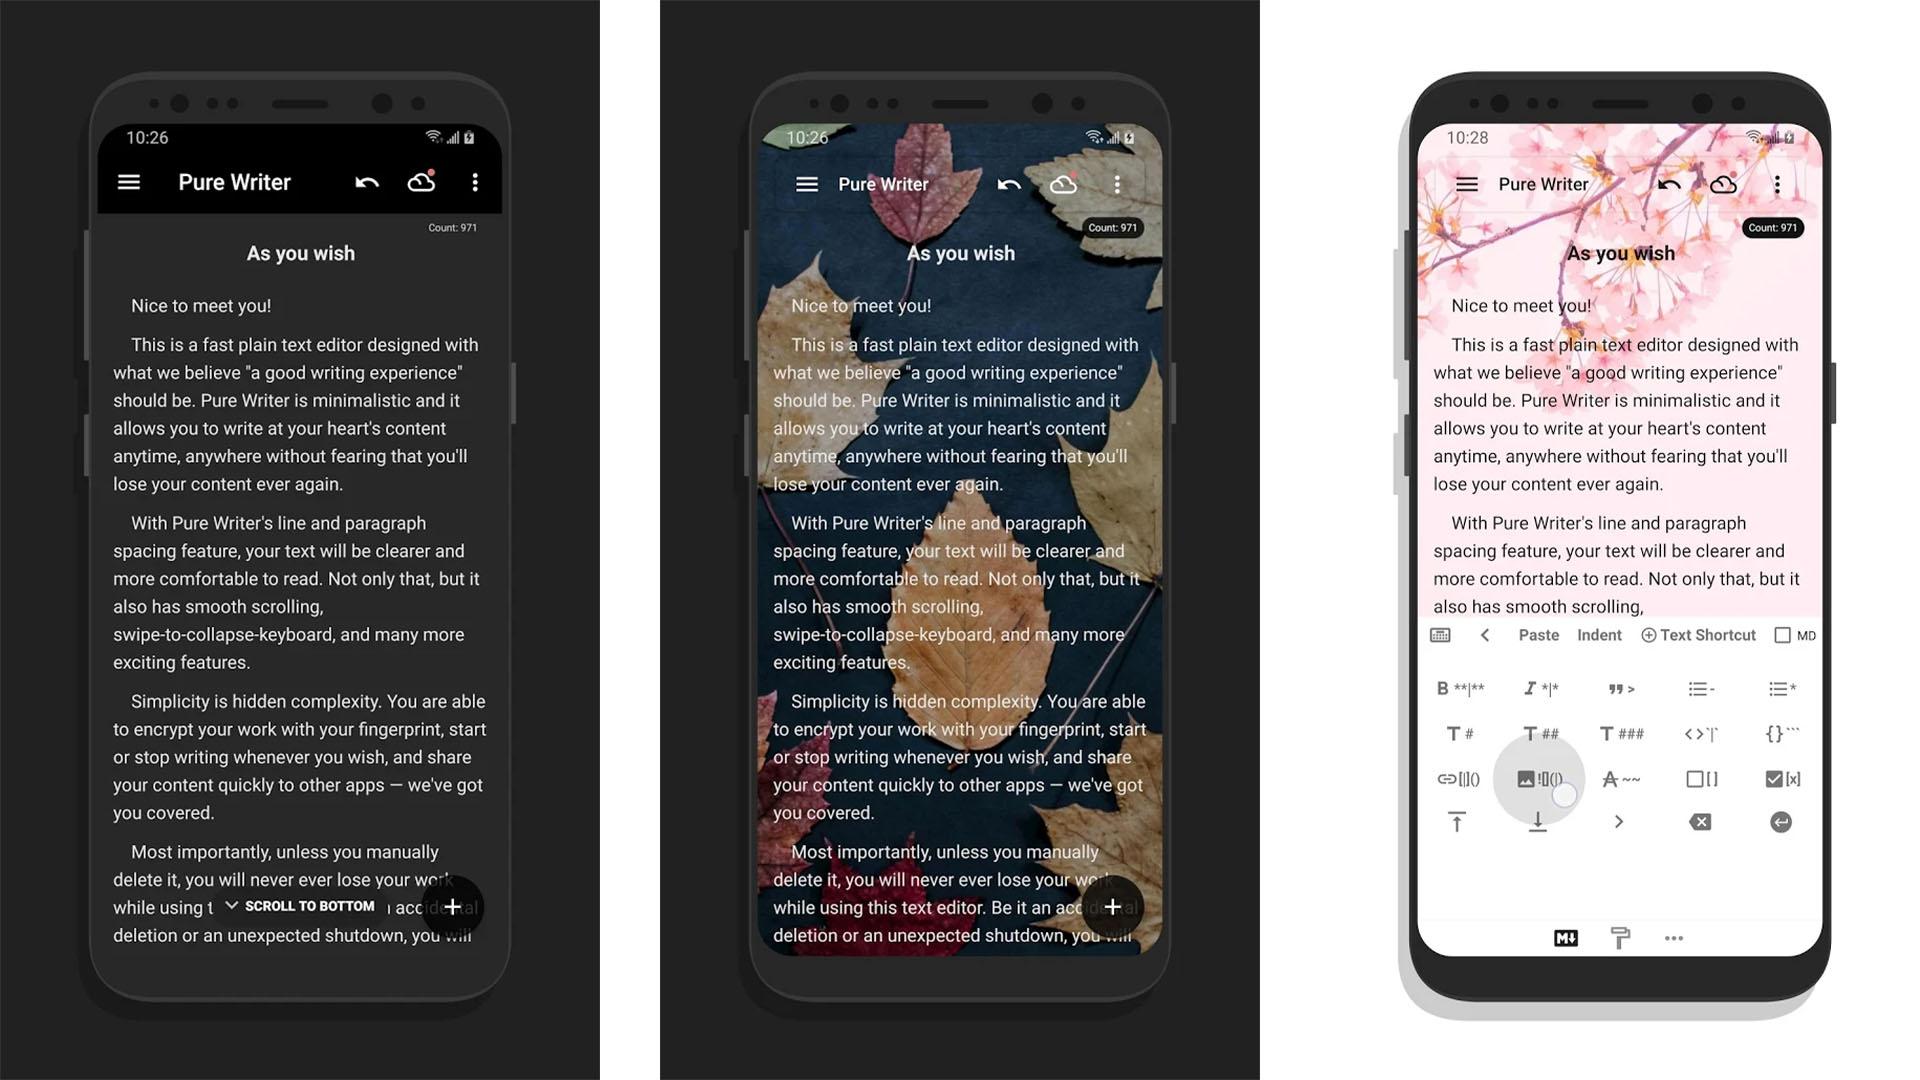 Pure Writer screenshot 2020